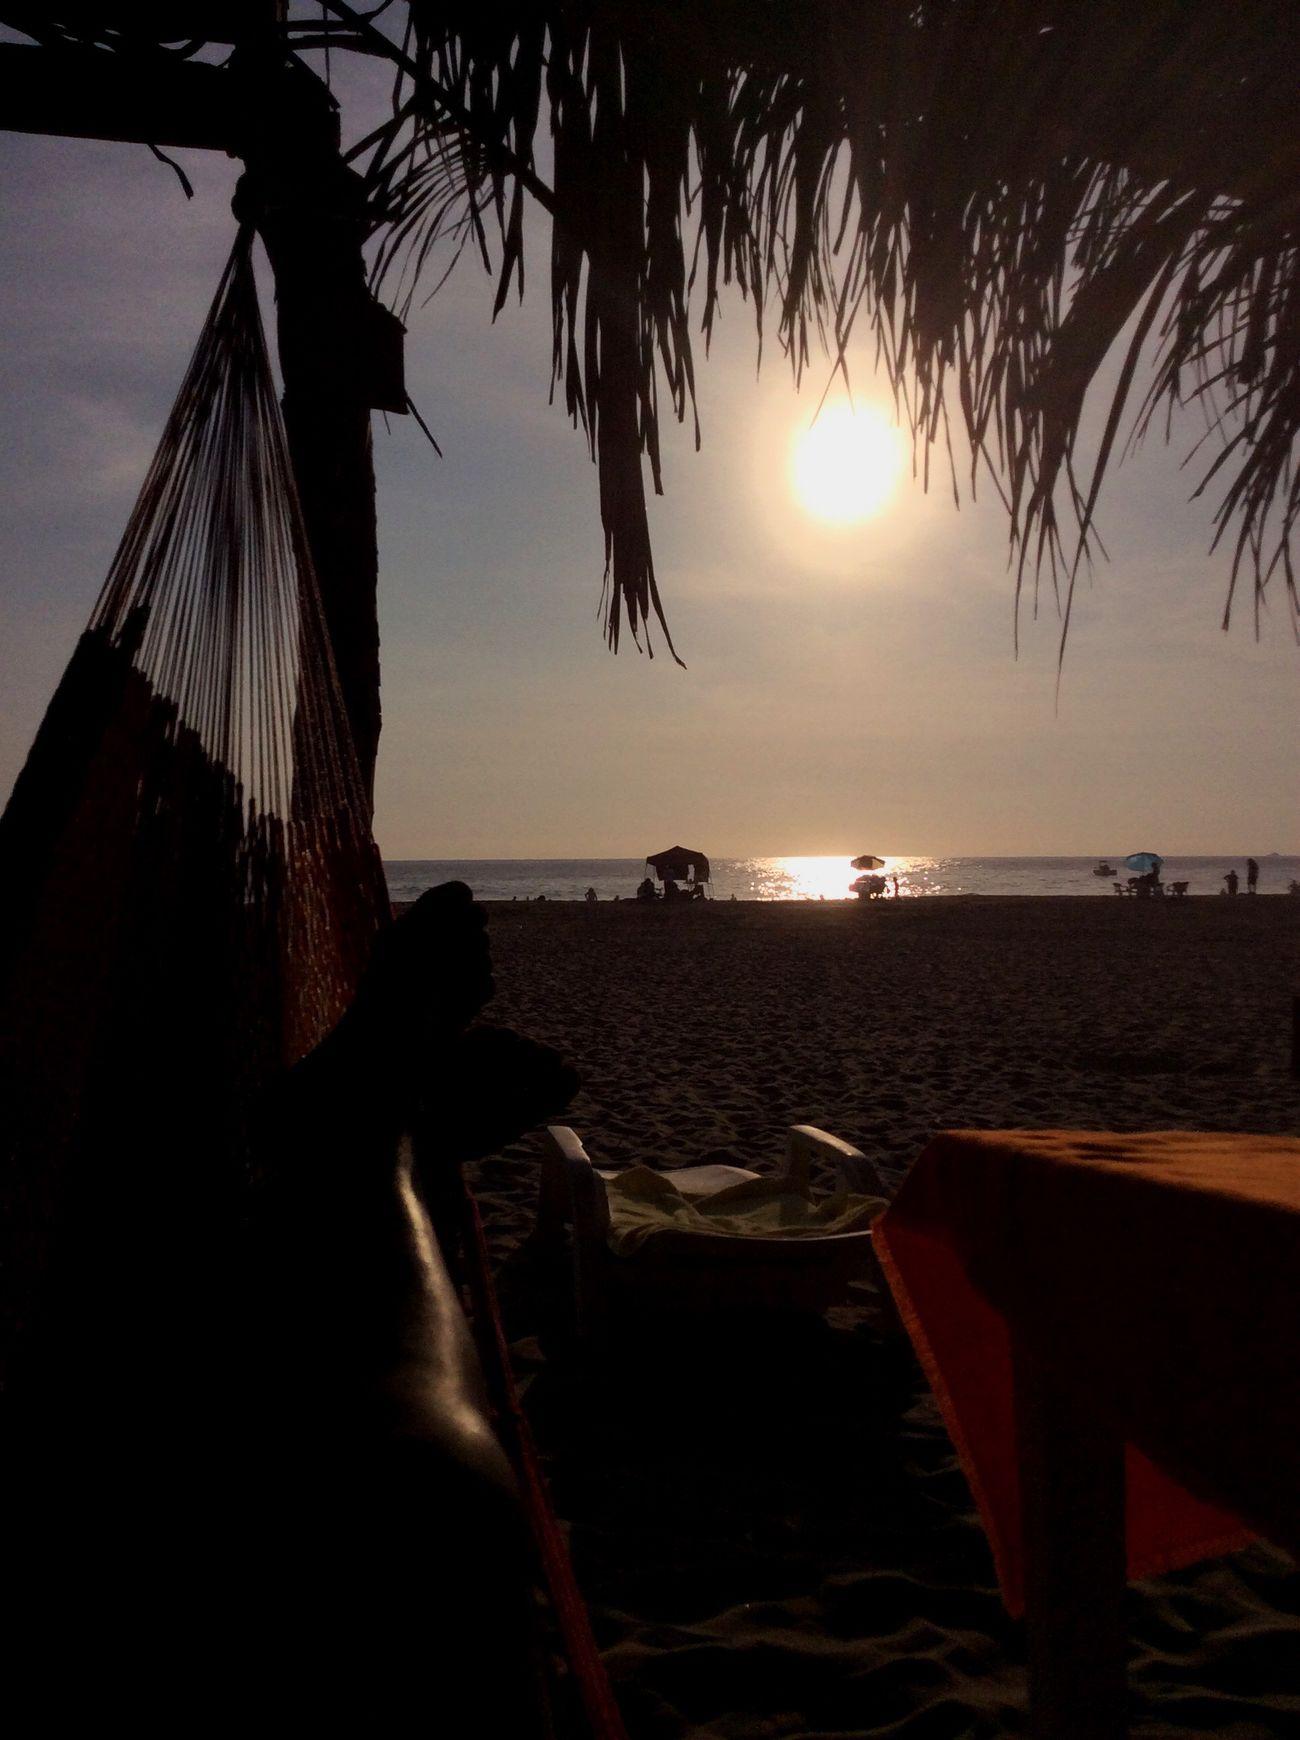 Beach Feelsogood